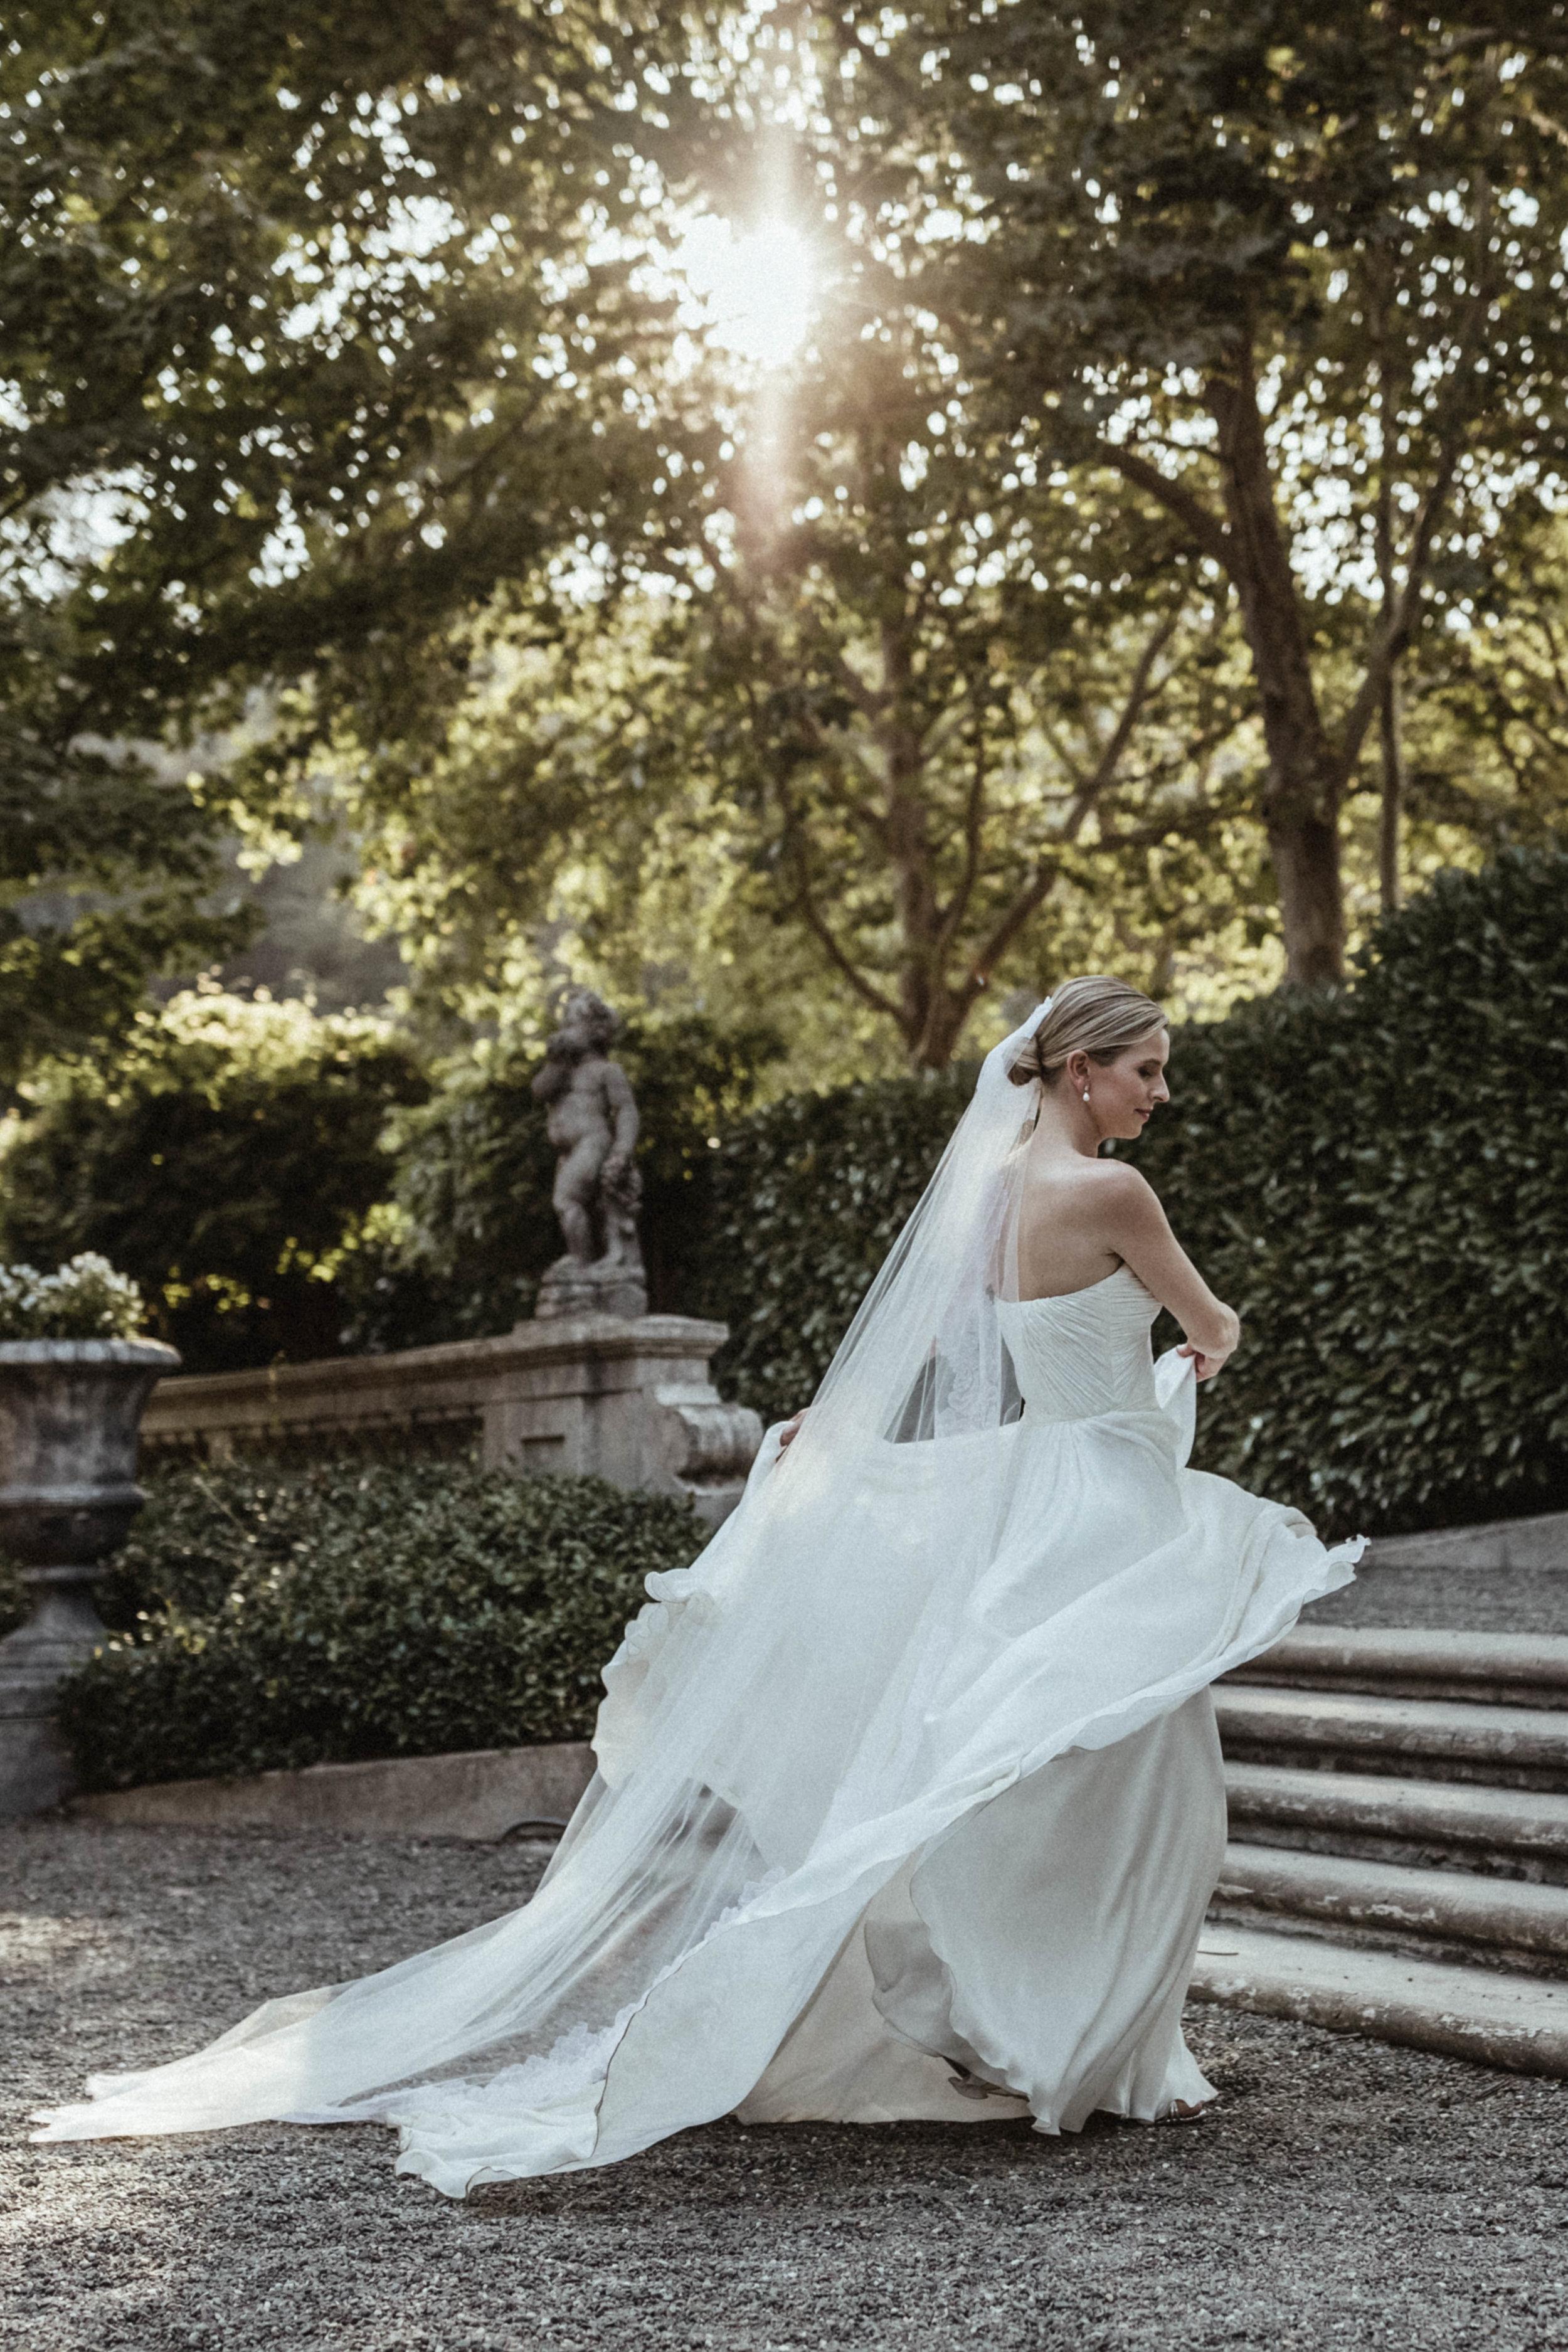 sarah-falugo-wedding-photographer-napa-valley-wedding-lauren-emery-0139.jpg